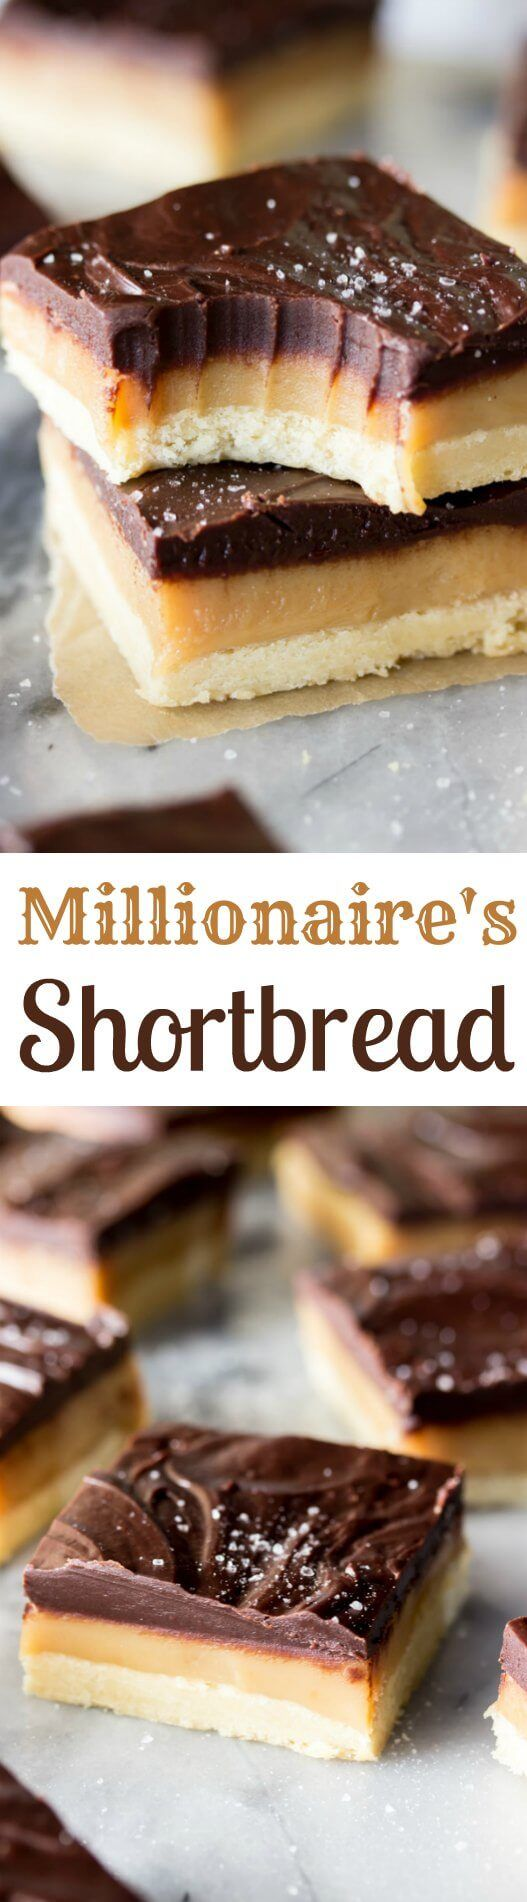 Millionaire's Shortbread, a rich and delicious dessert || Sugar Spun Run via @sugarspunrun